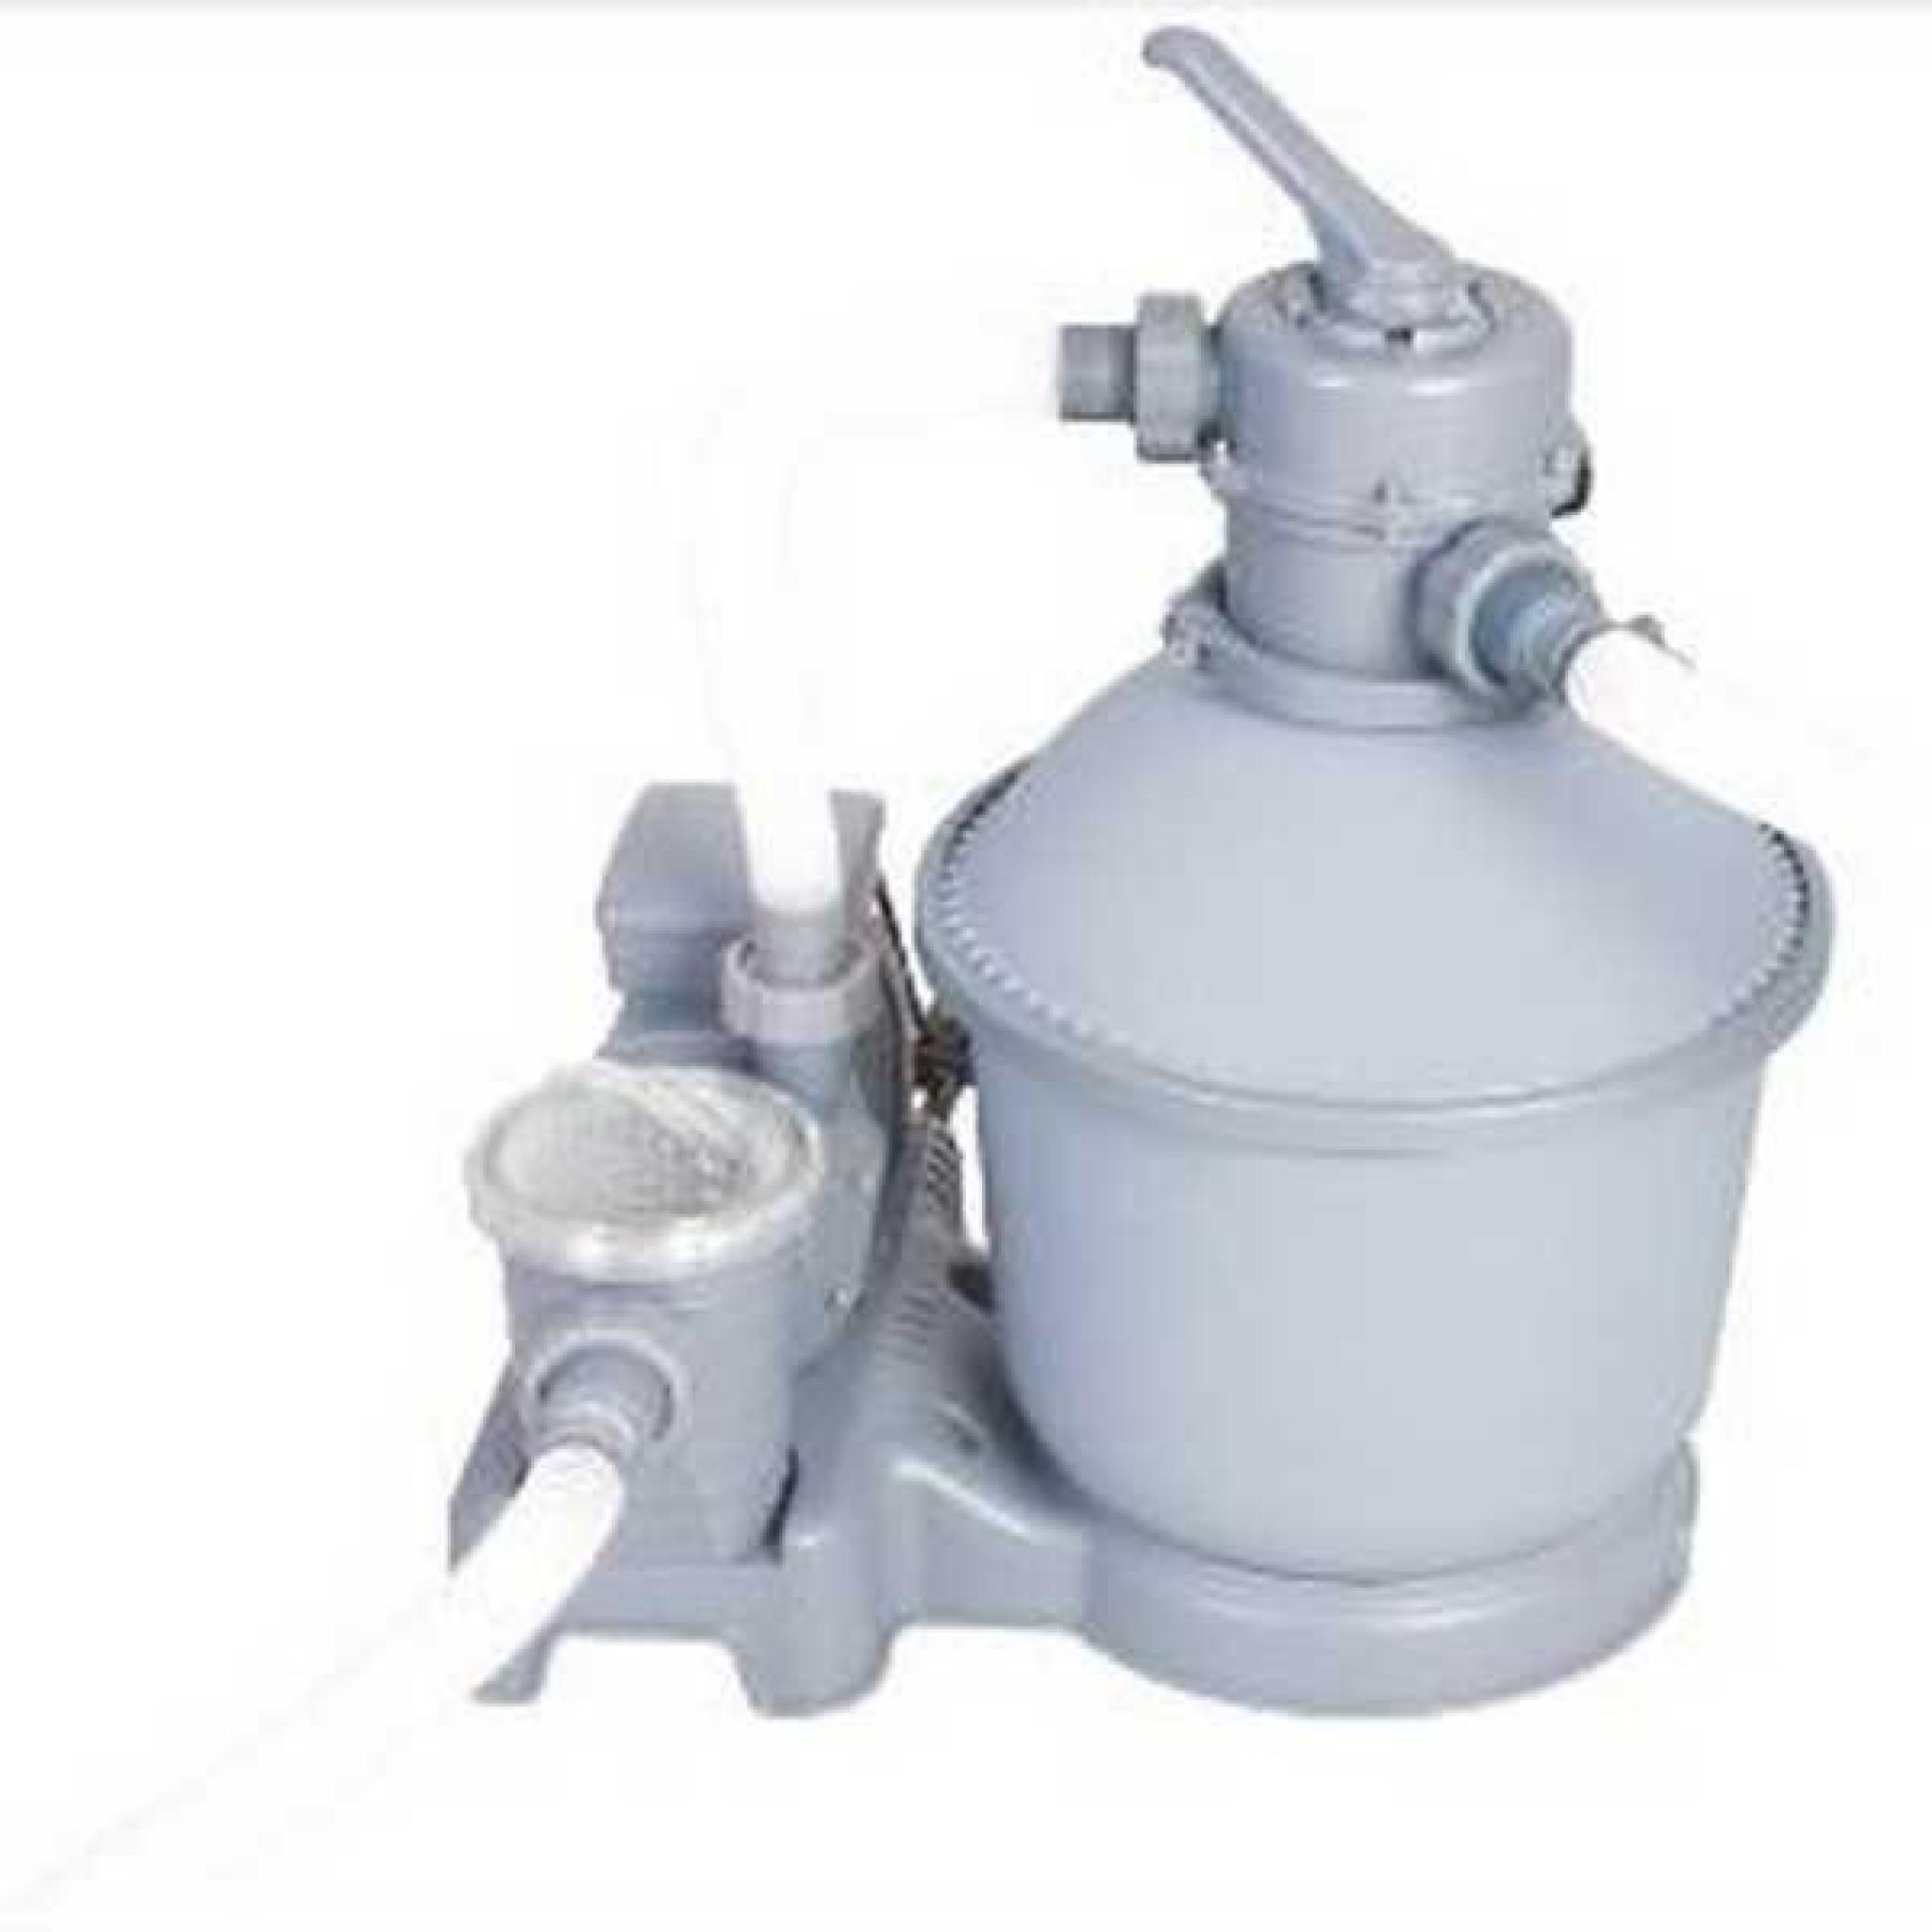 Kit piscine hors sol acier bestway m filtration - Piscine hors sol acier pas cher ...